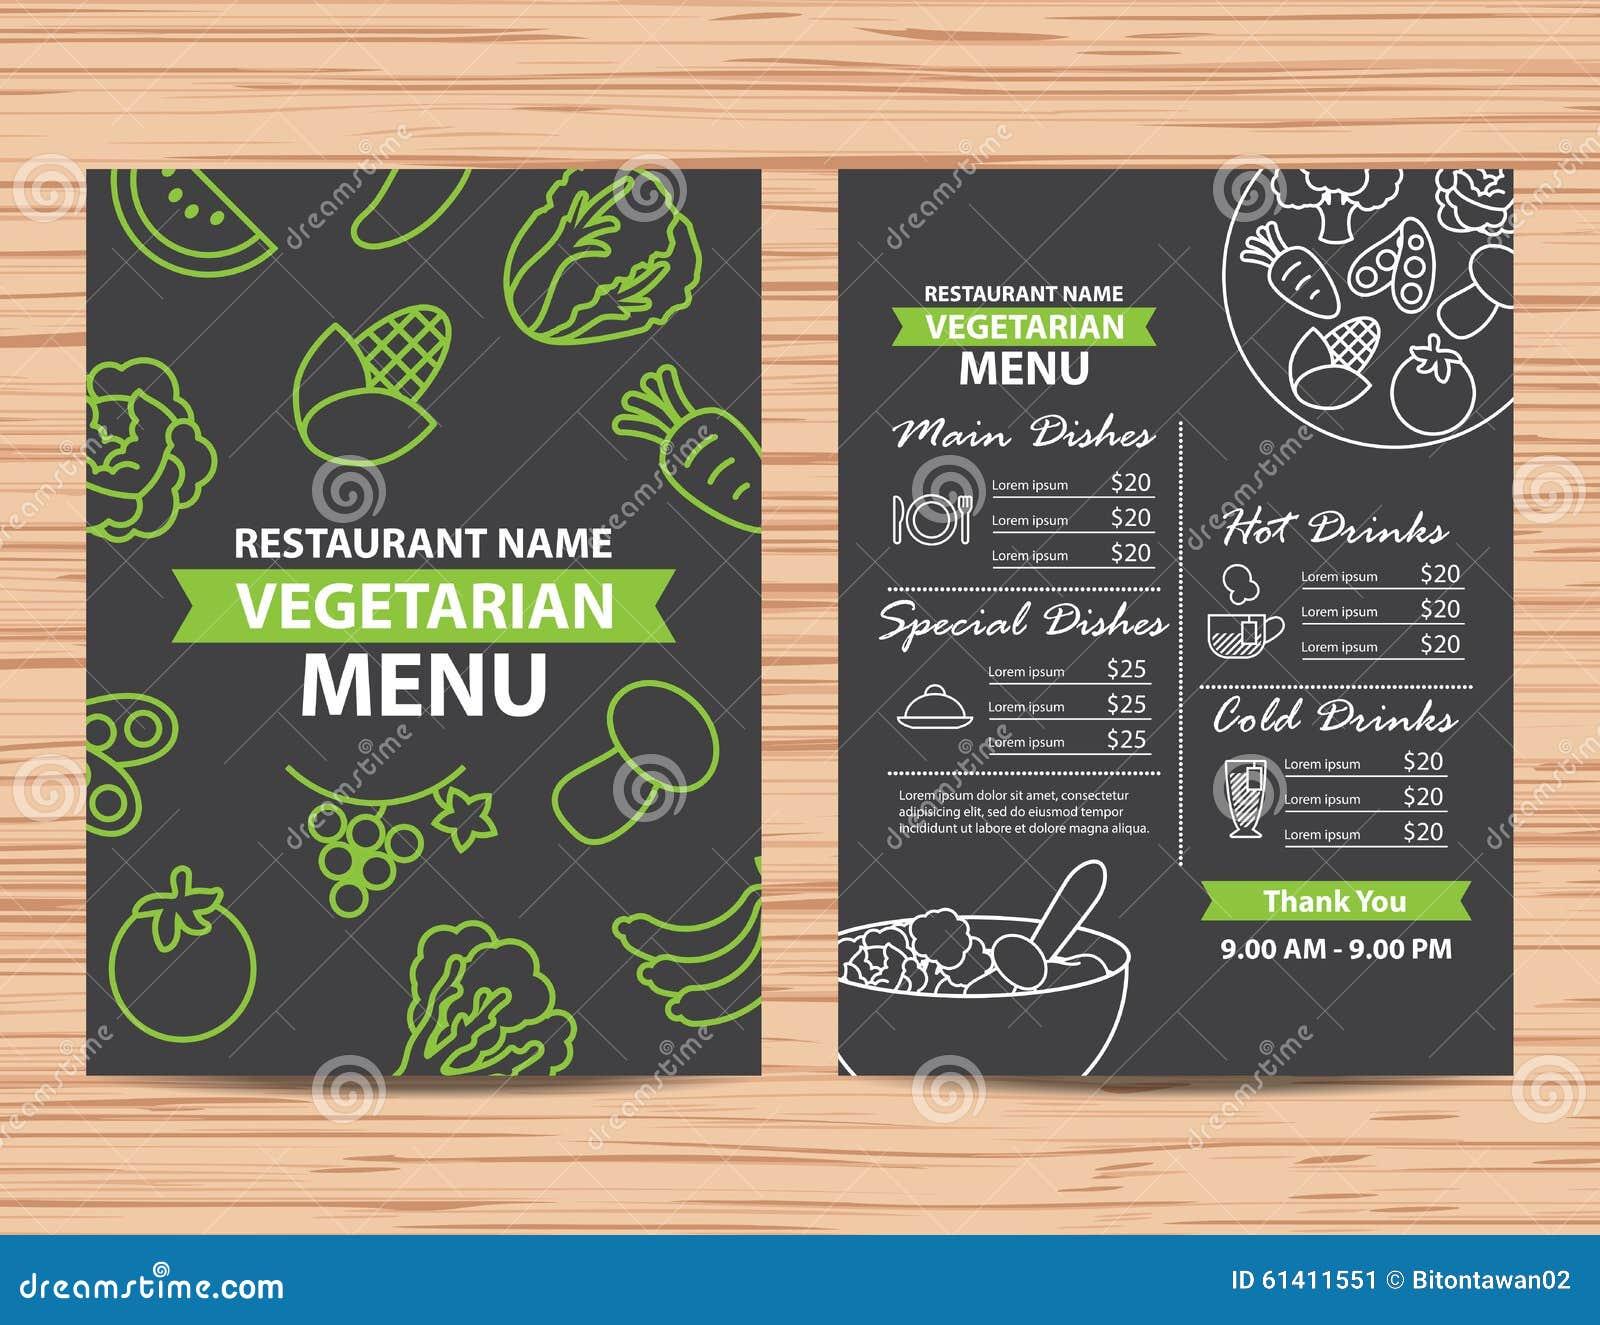 Verde Restaurant Menu